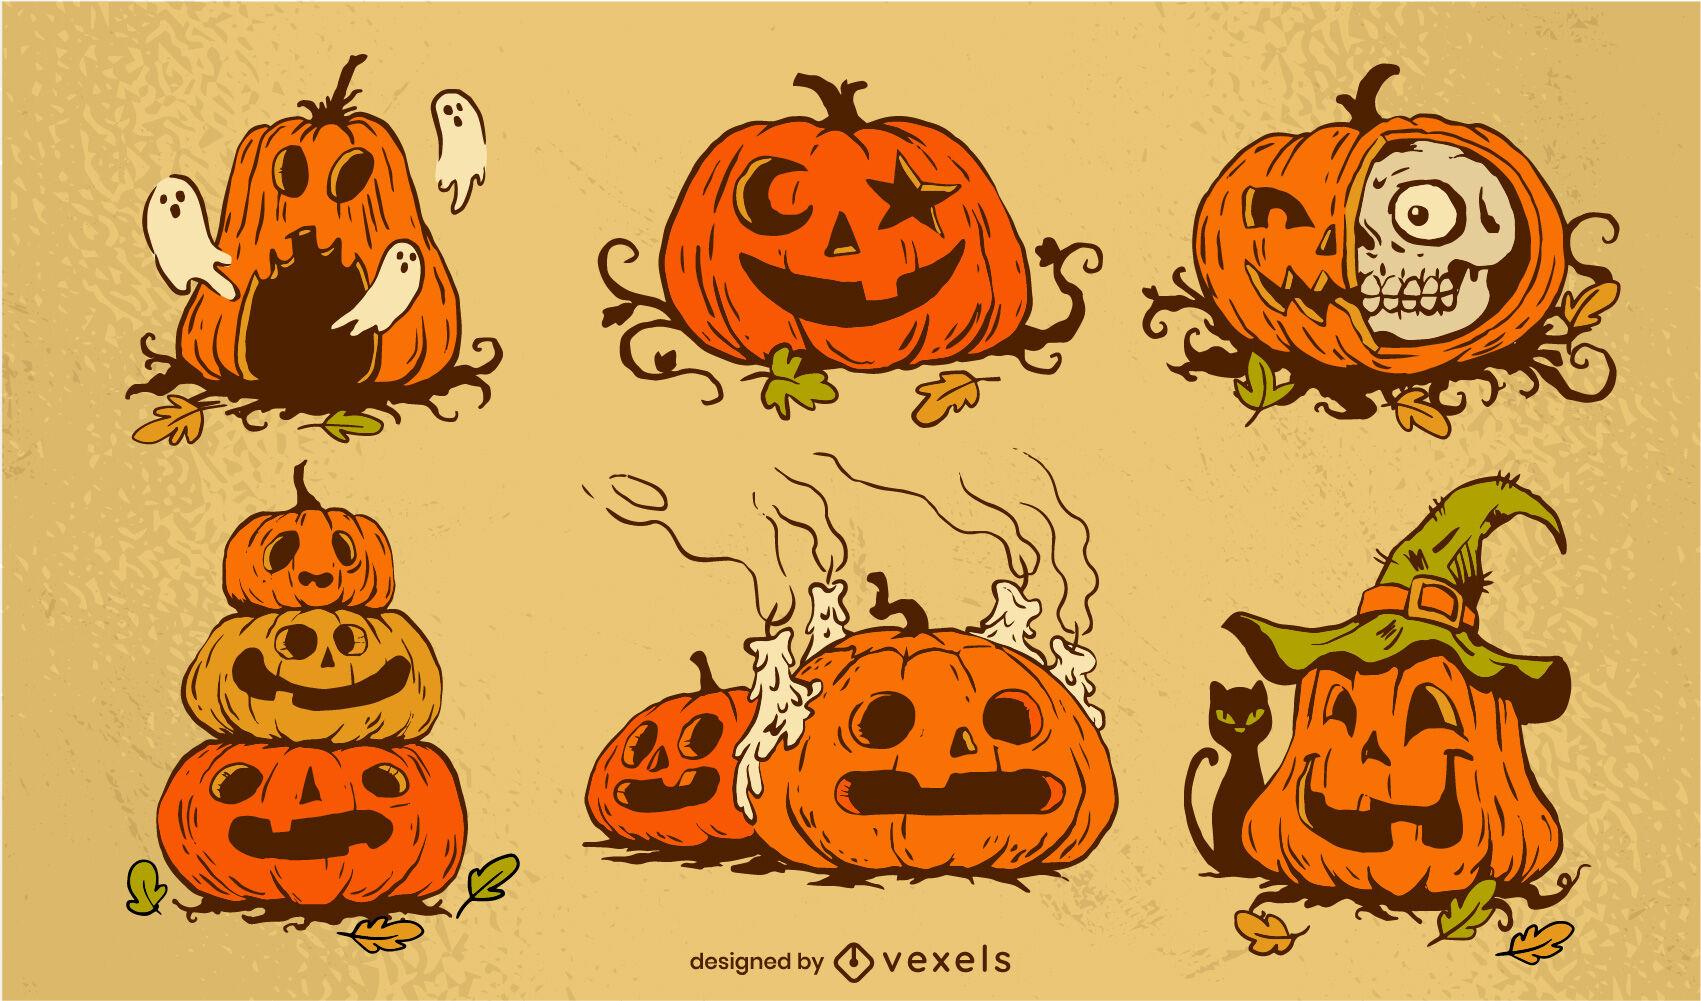 Halloween-Feiertag gruseliges K?rbis-Vintage-Set